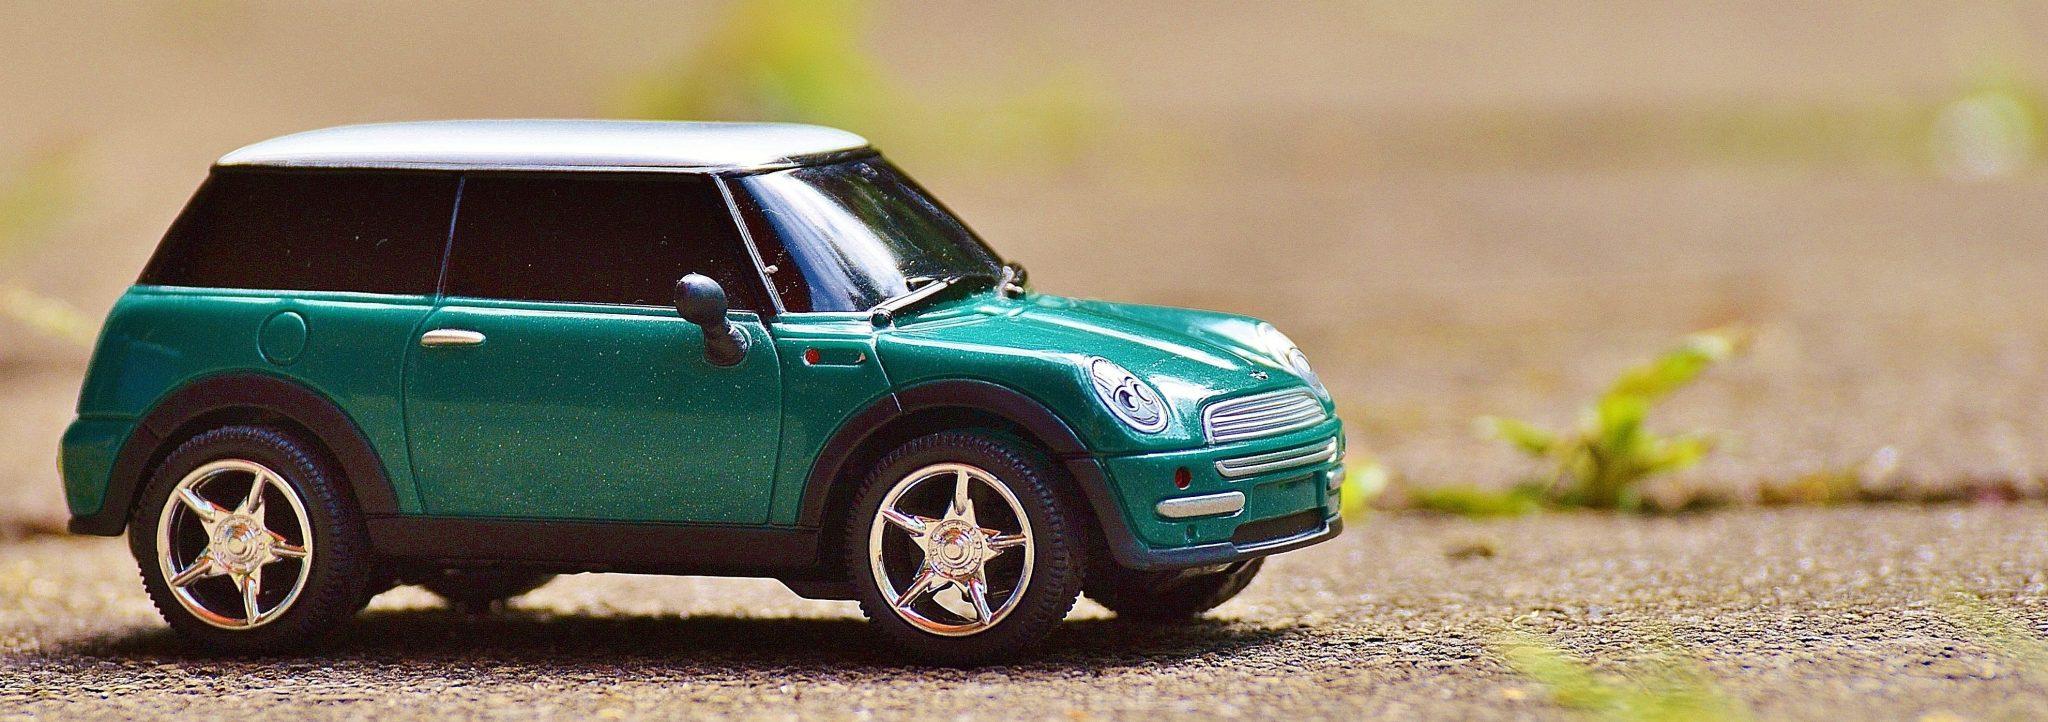 car-macro-mini-cooper